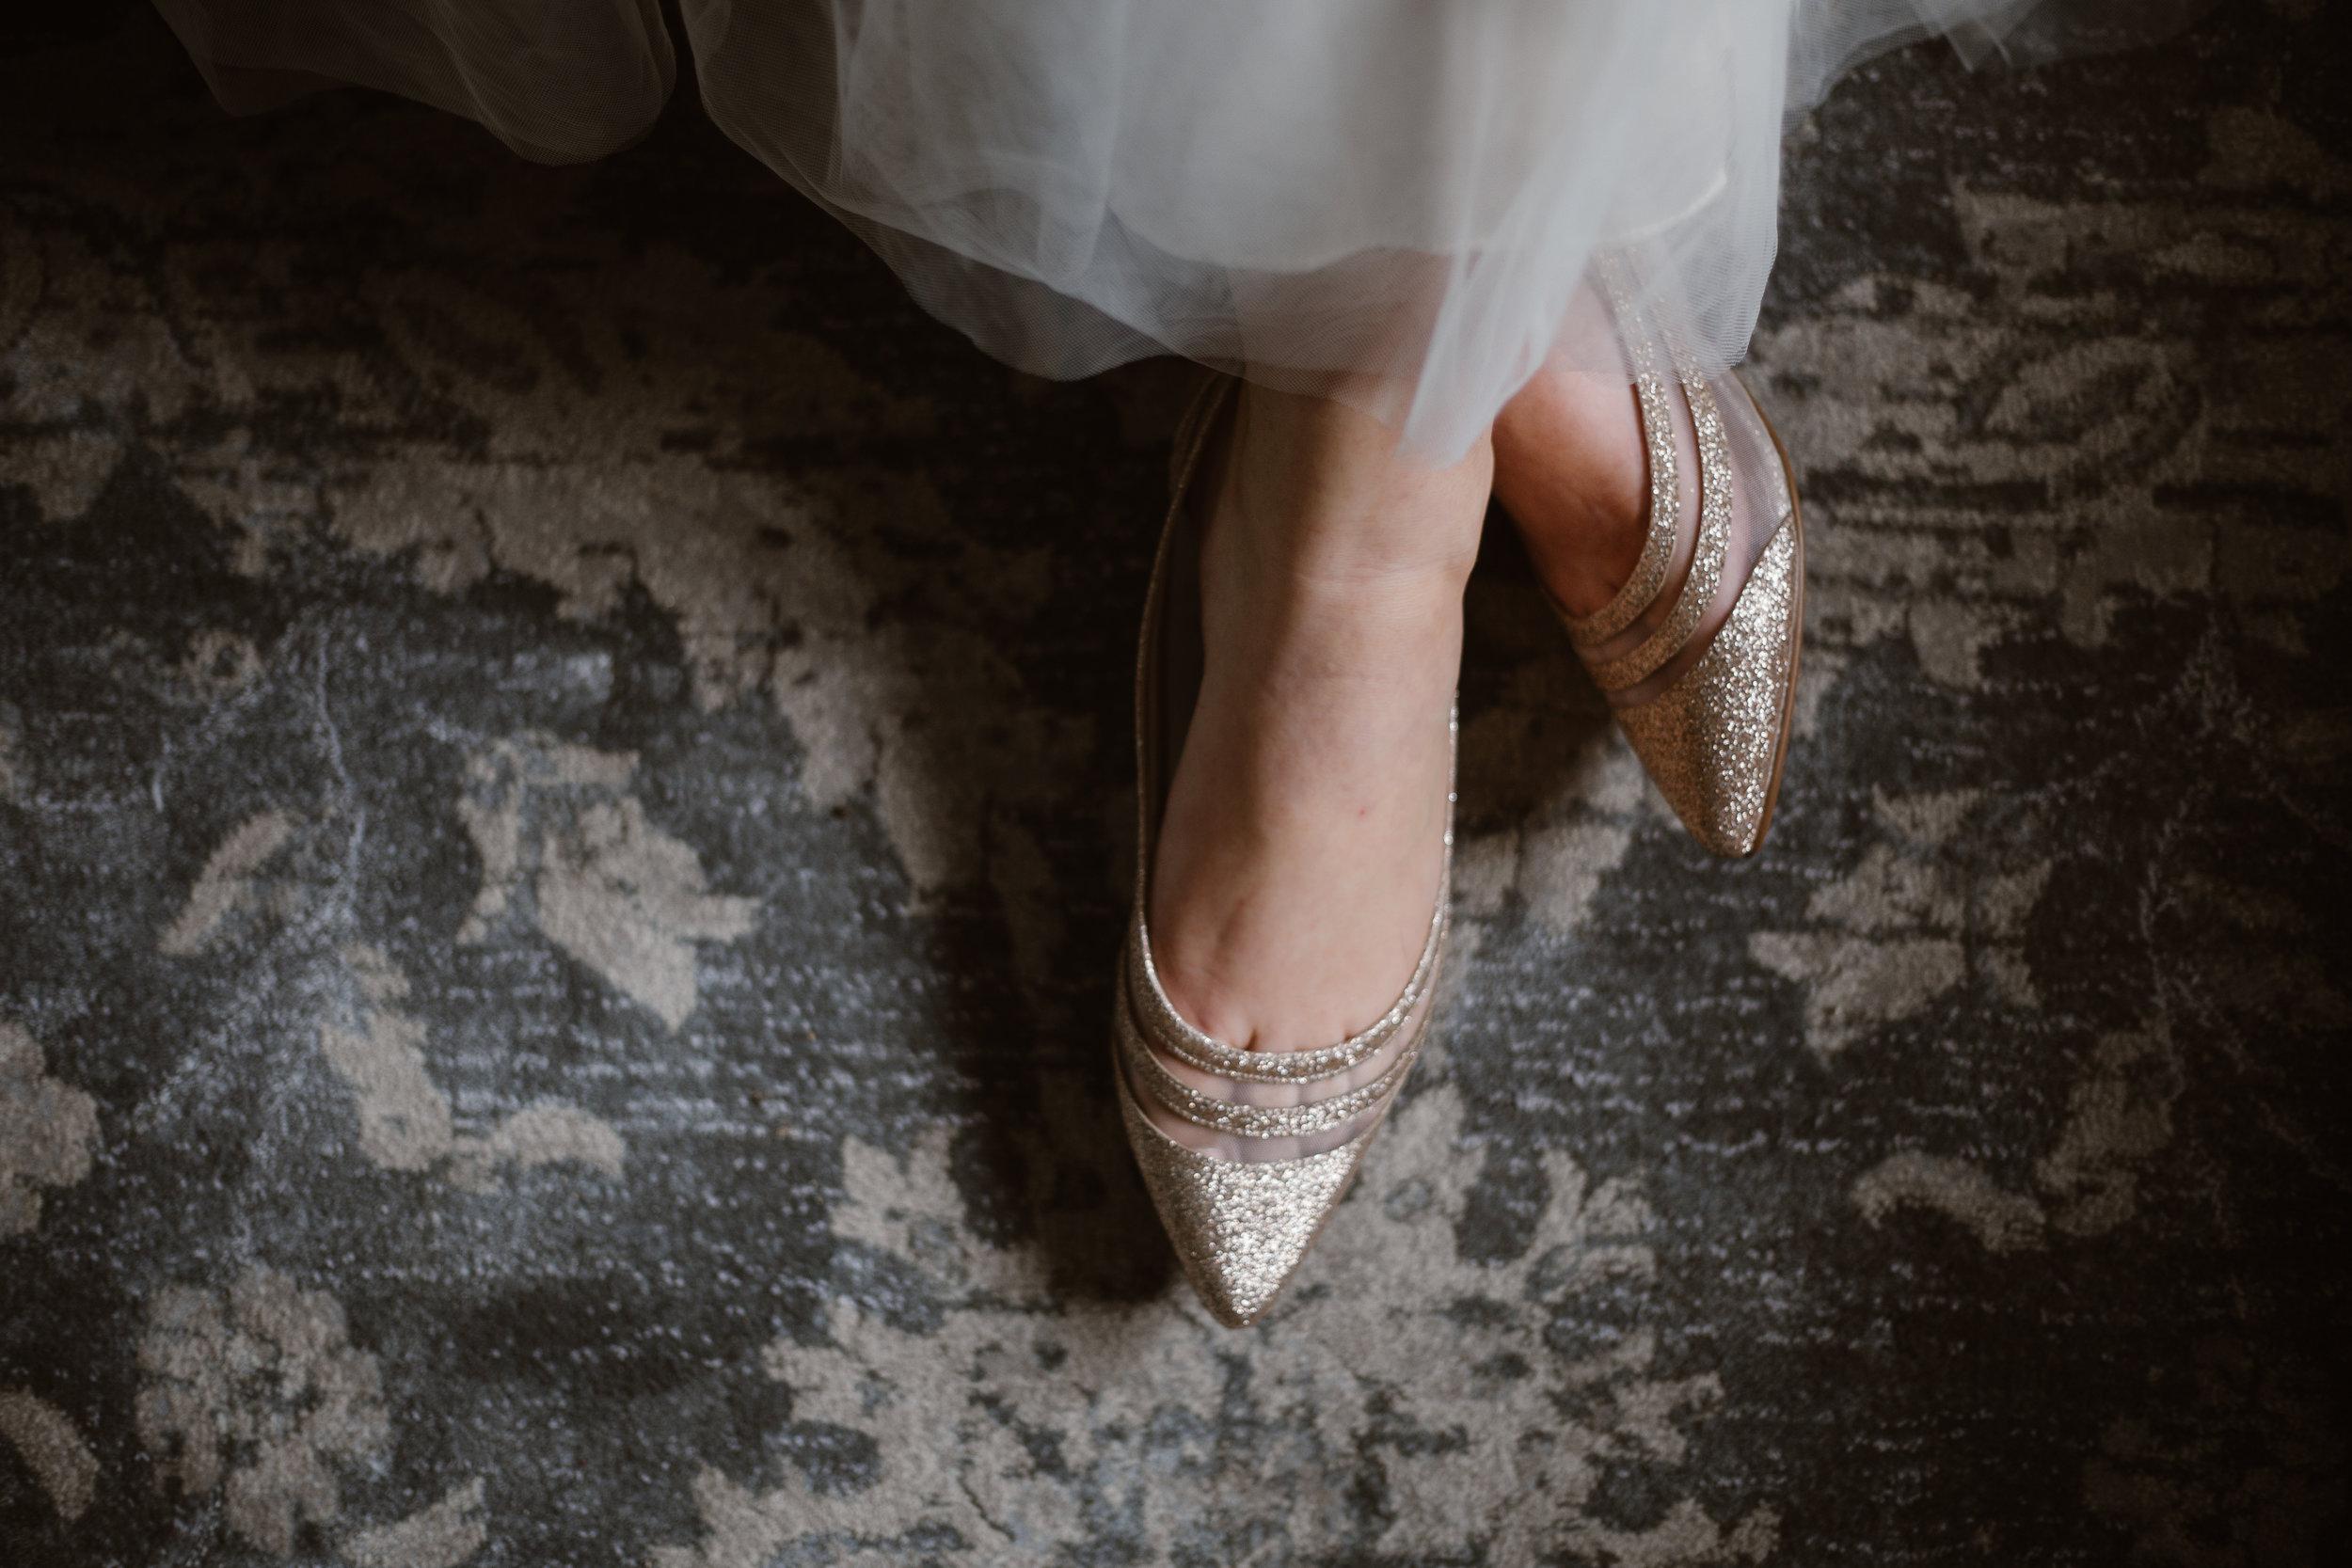 Rose Gold Bridal Flats - A Burgundy + Bronze Ramble Creek Fall Wedding - Erin Morrison Photography